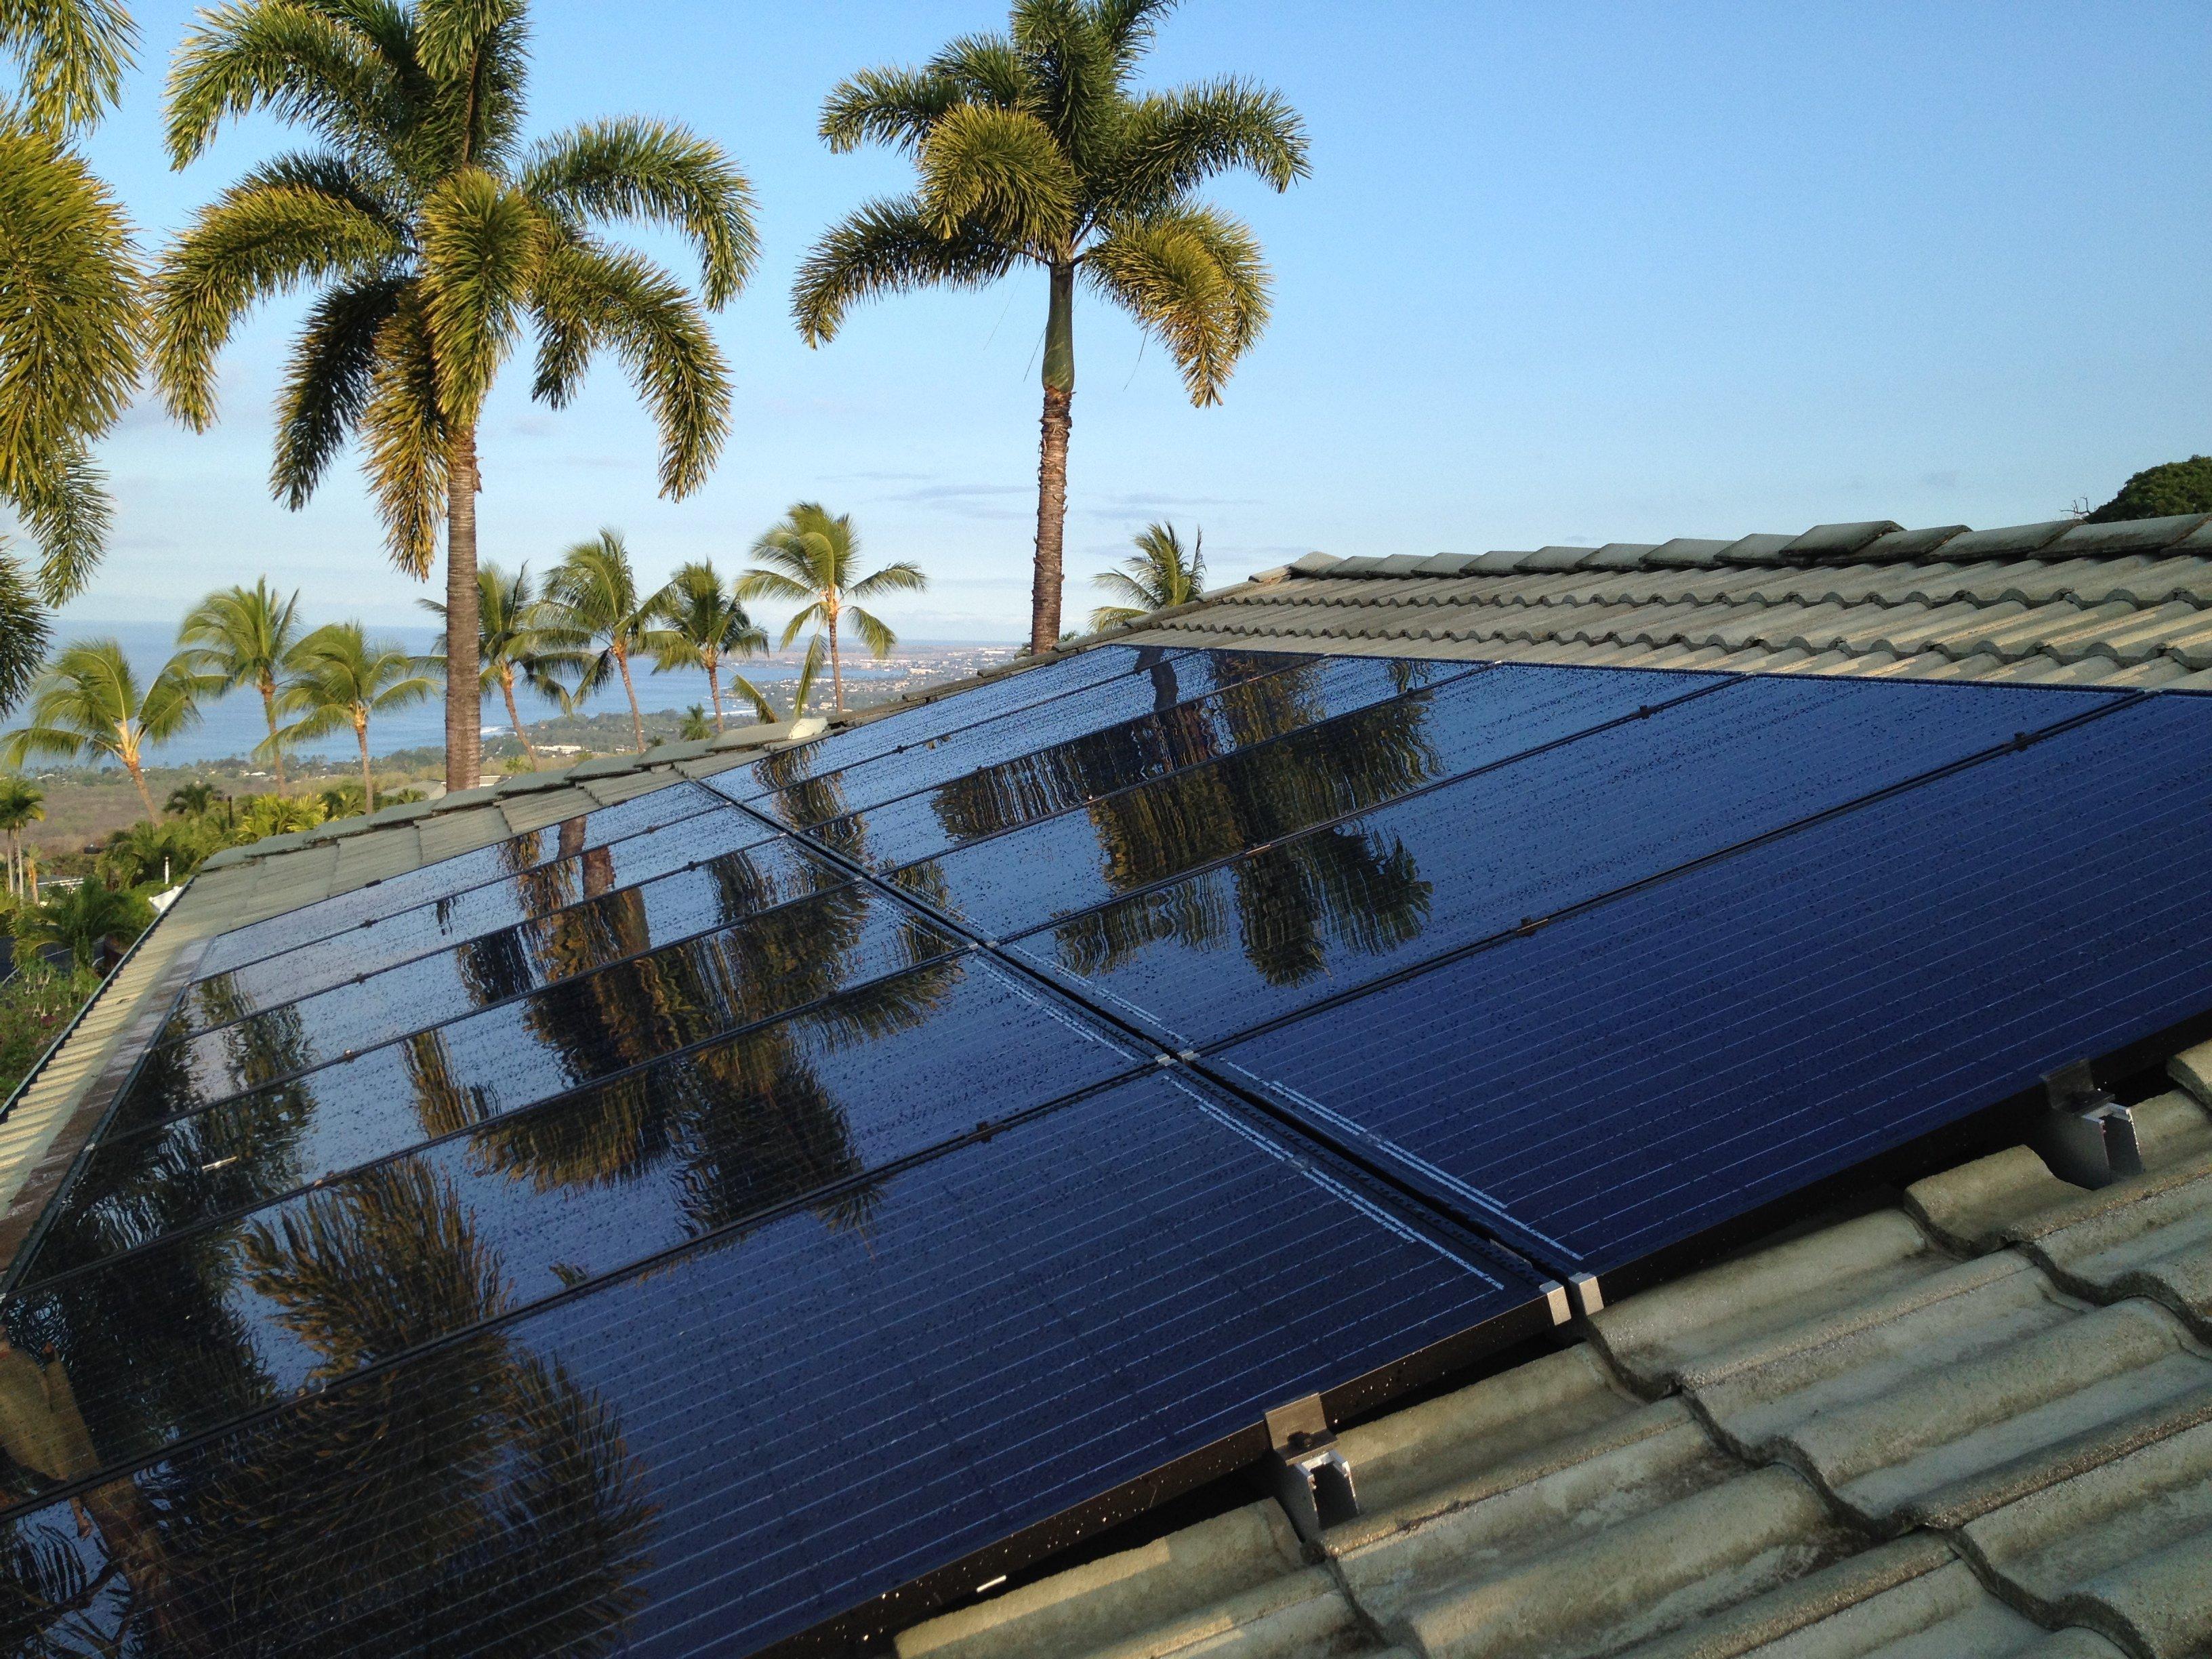 7.42 KW Solar PV system installed on rooftop in Honokaa, HI